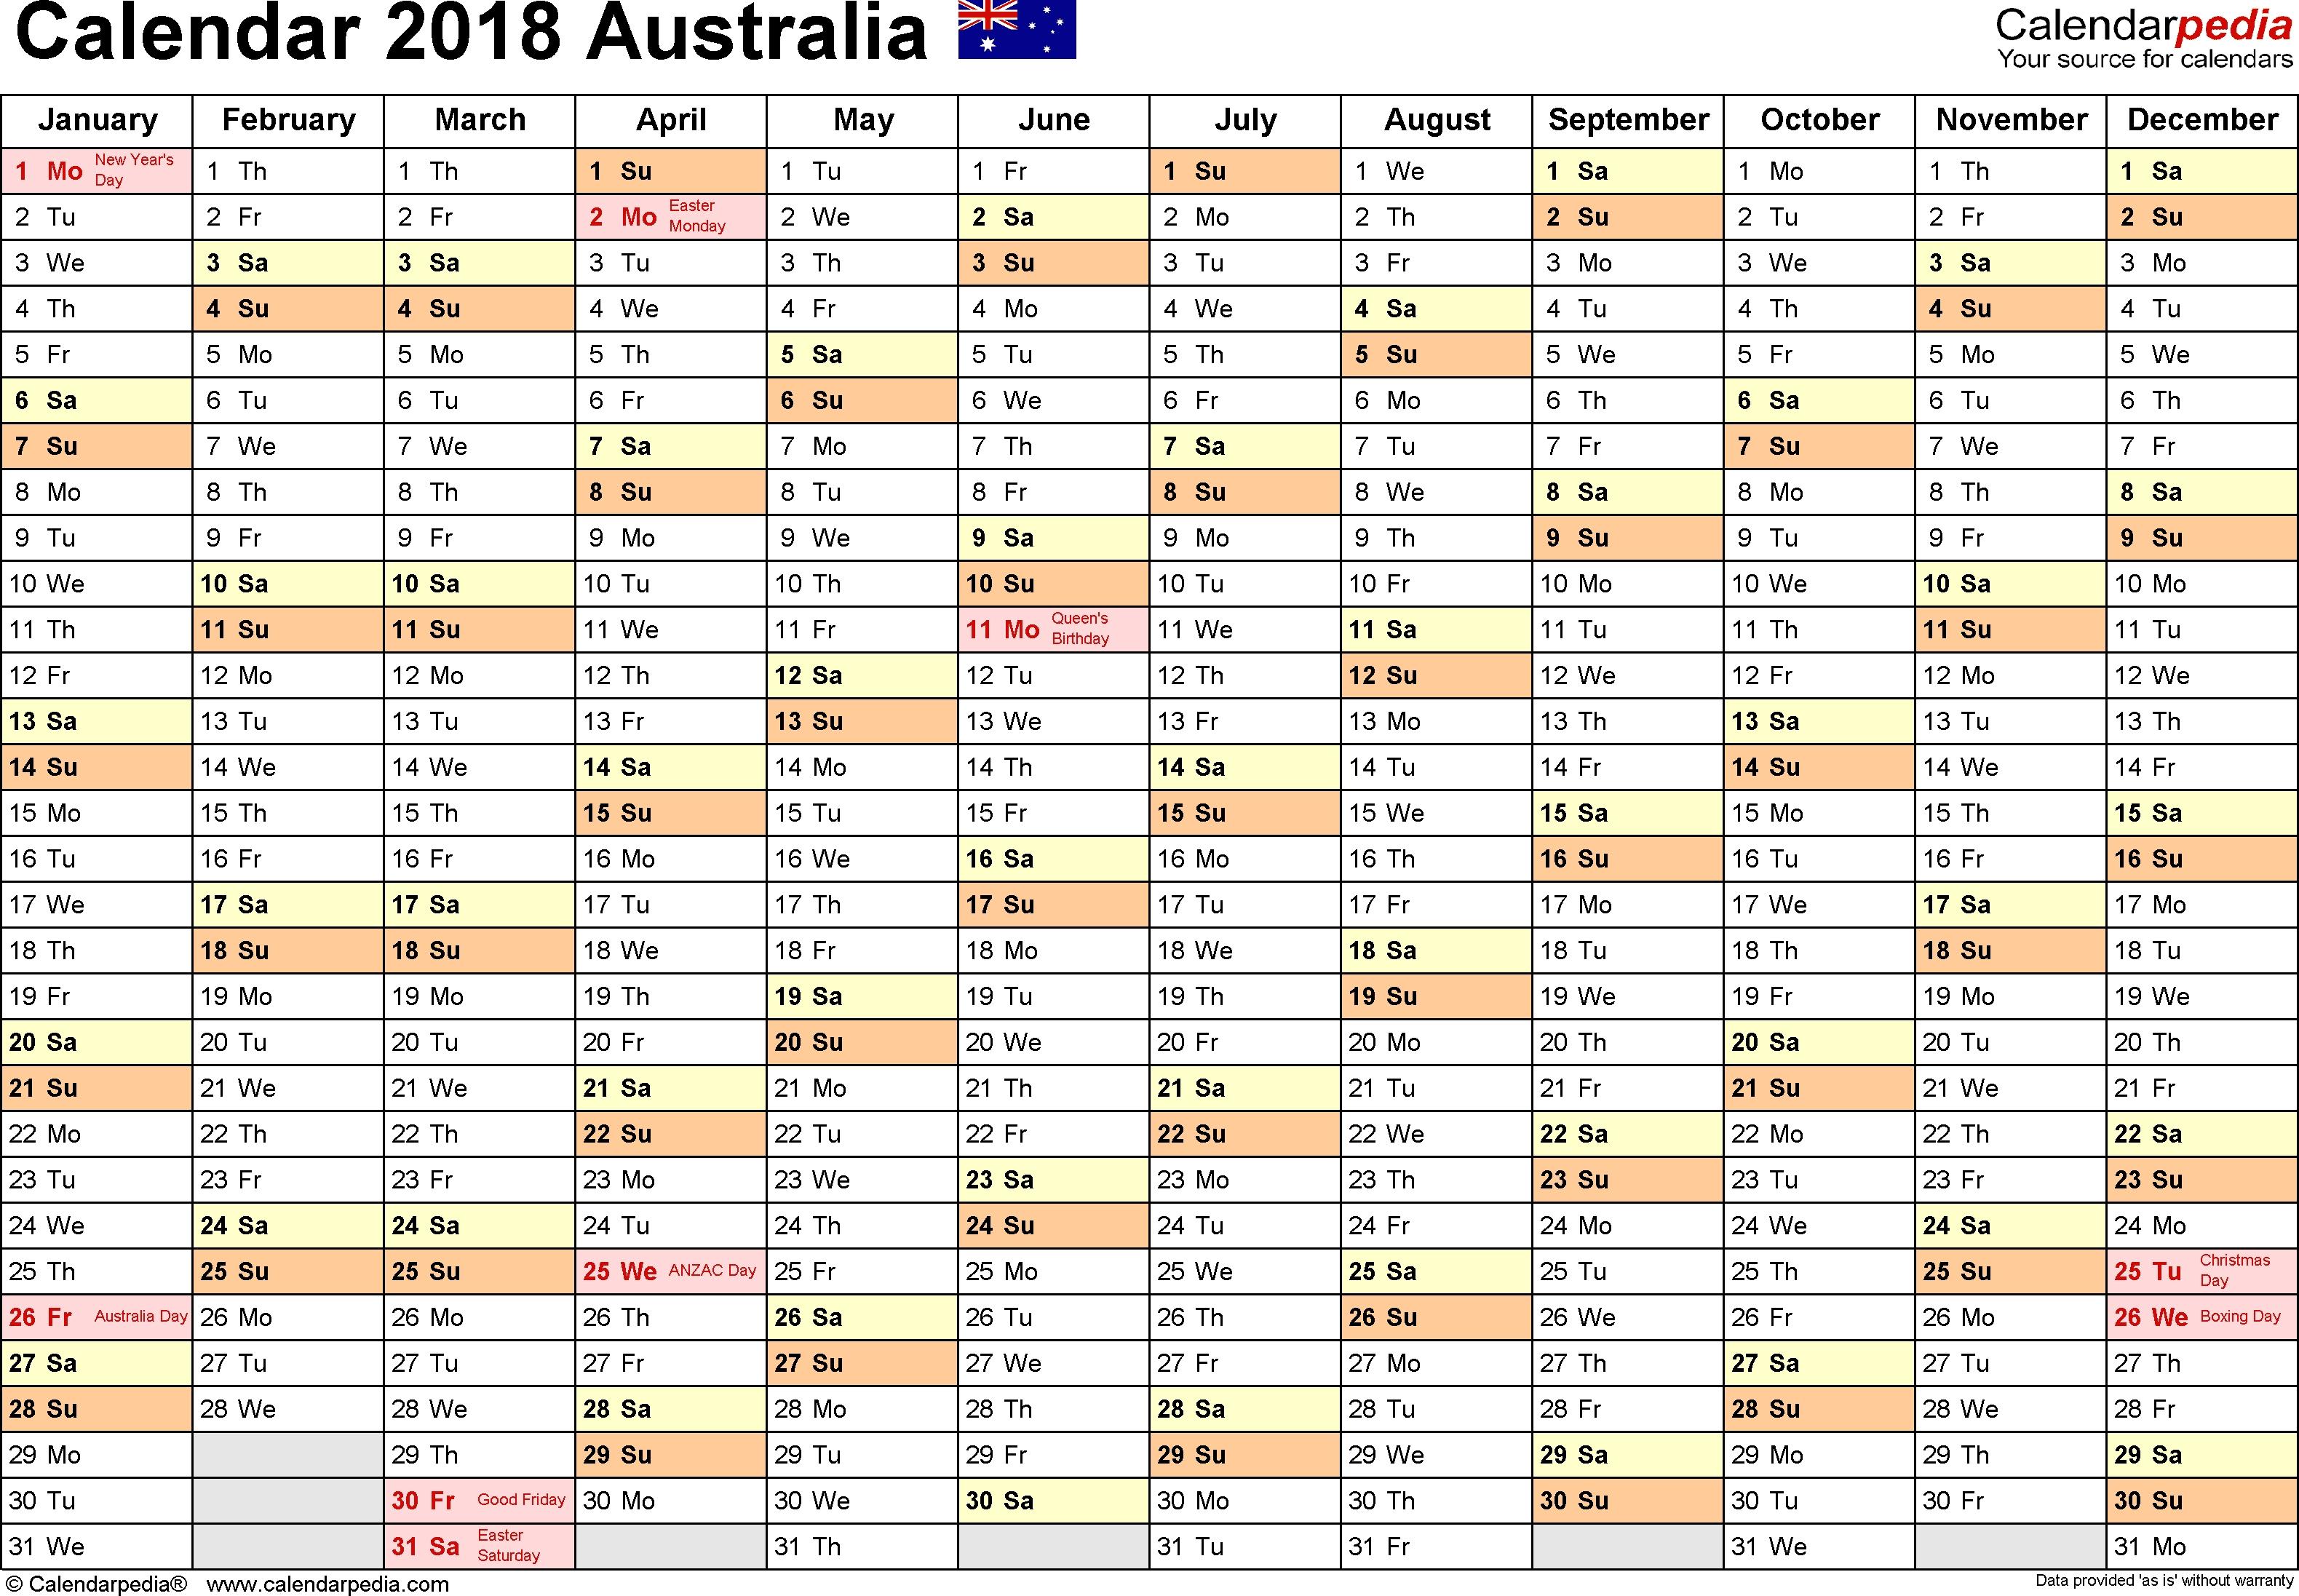 Australia Calendar 2018 - Free Word Calendar Templates  Australian Financial Year Calendar